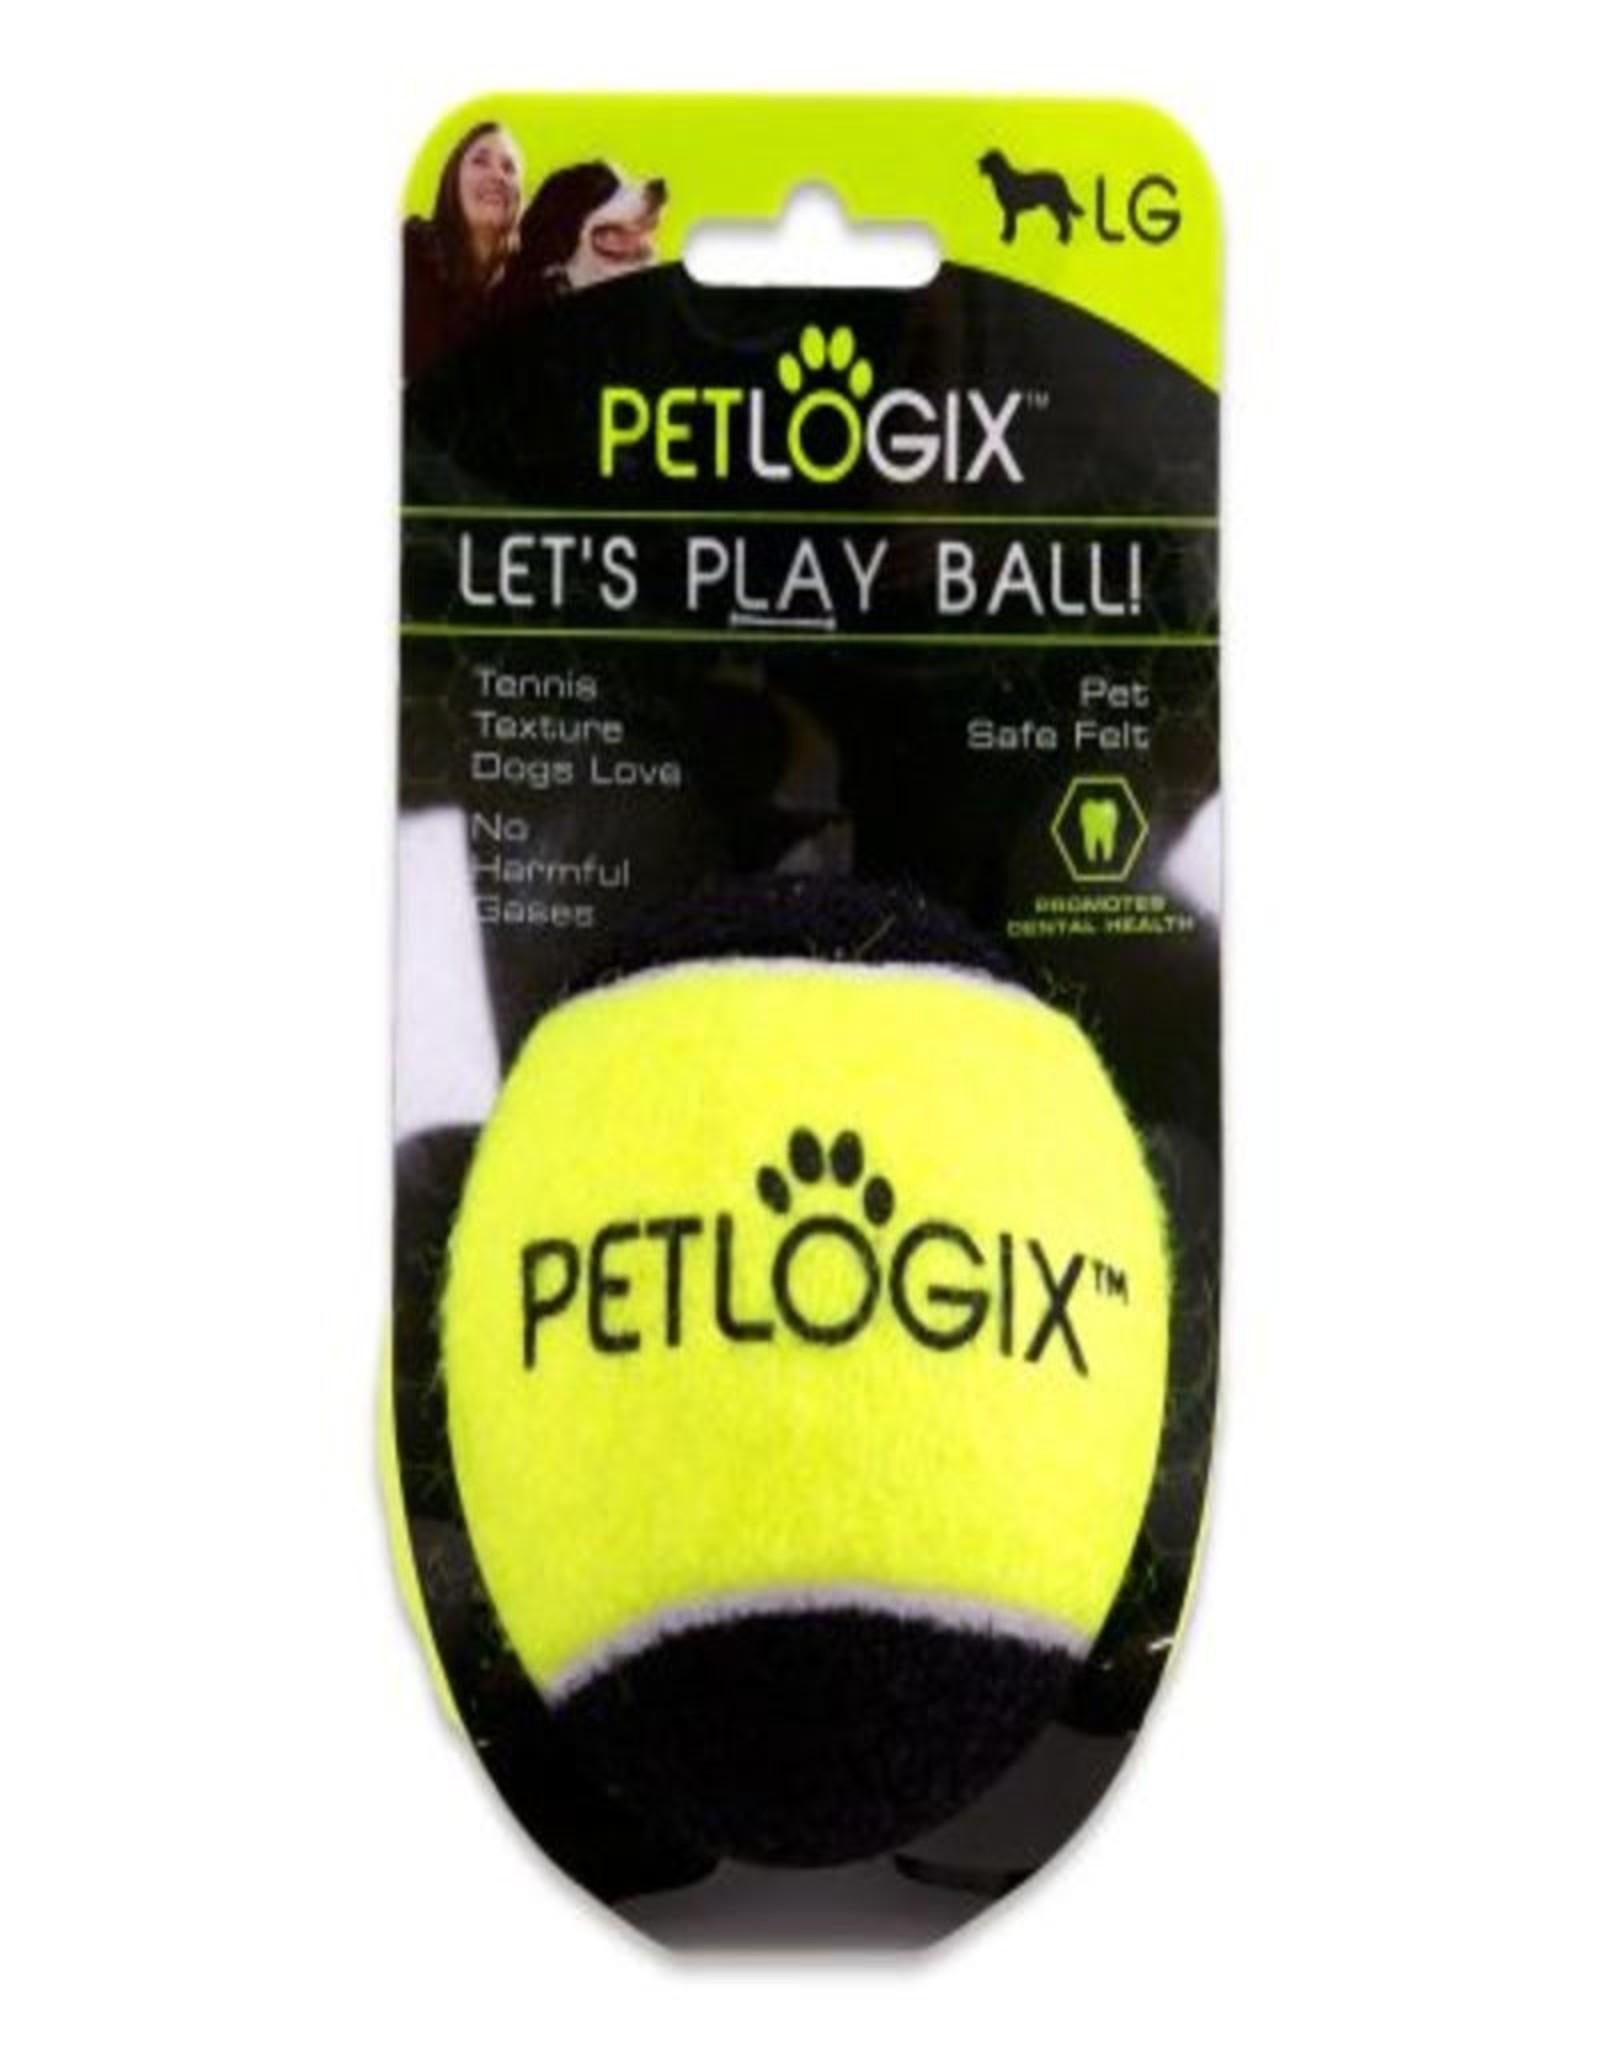 Petlogix Single Tennis Ball